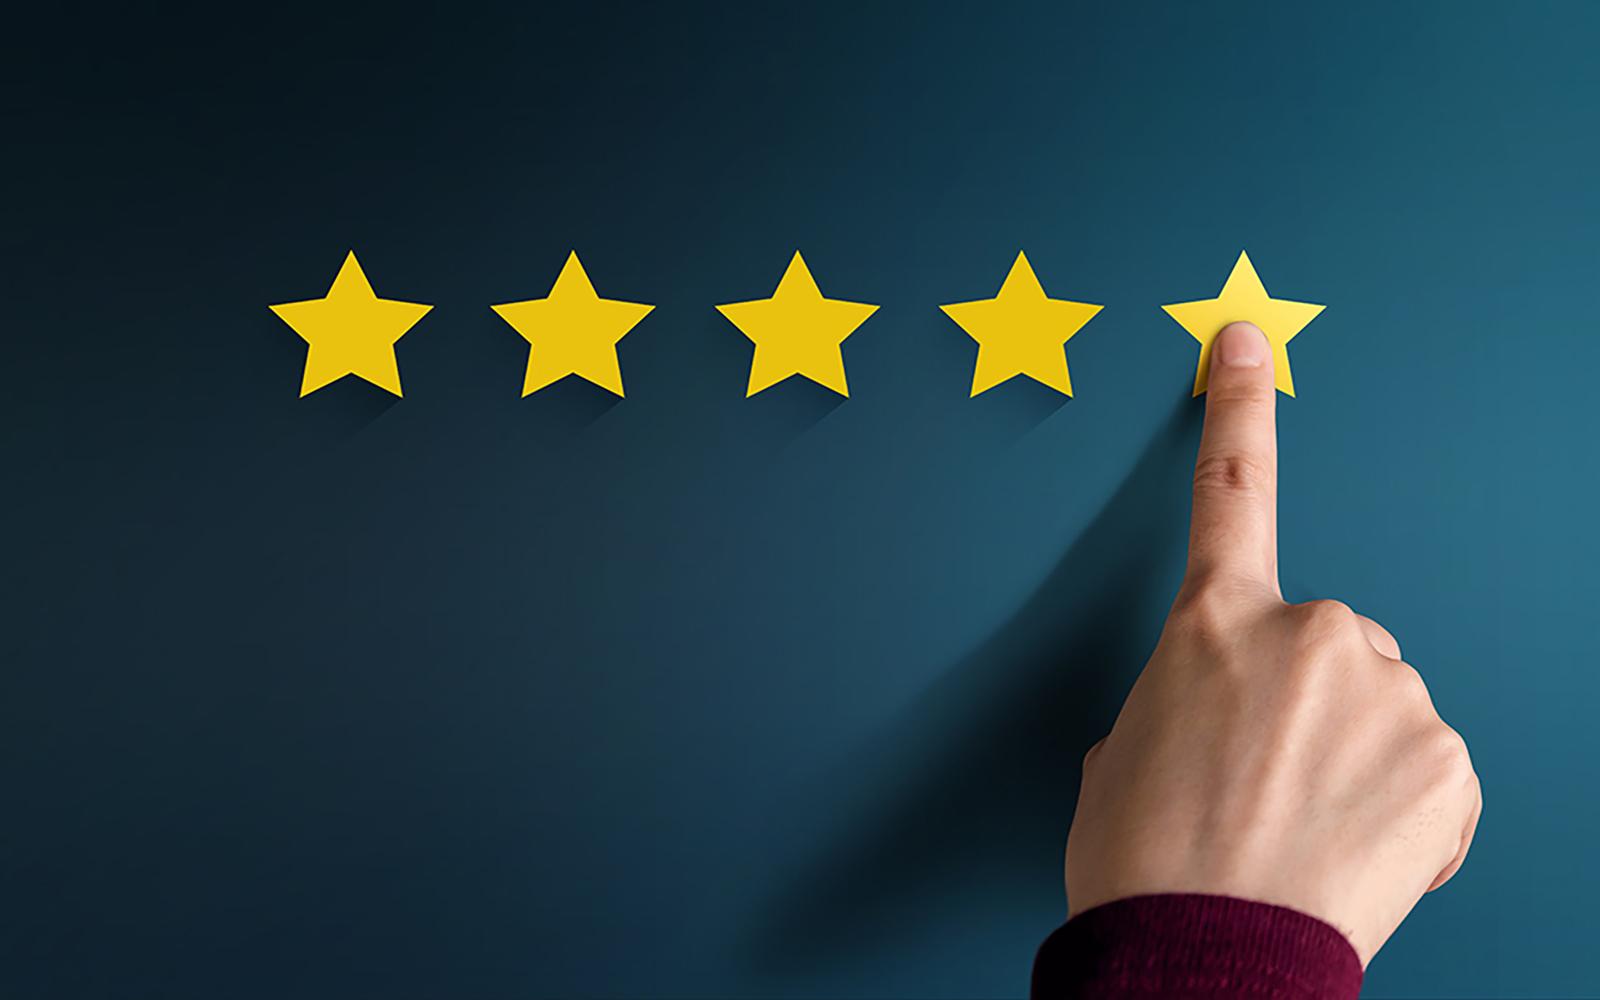 Vijf customer experience trends